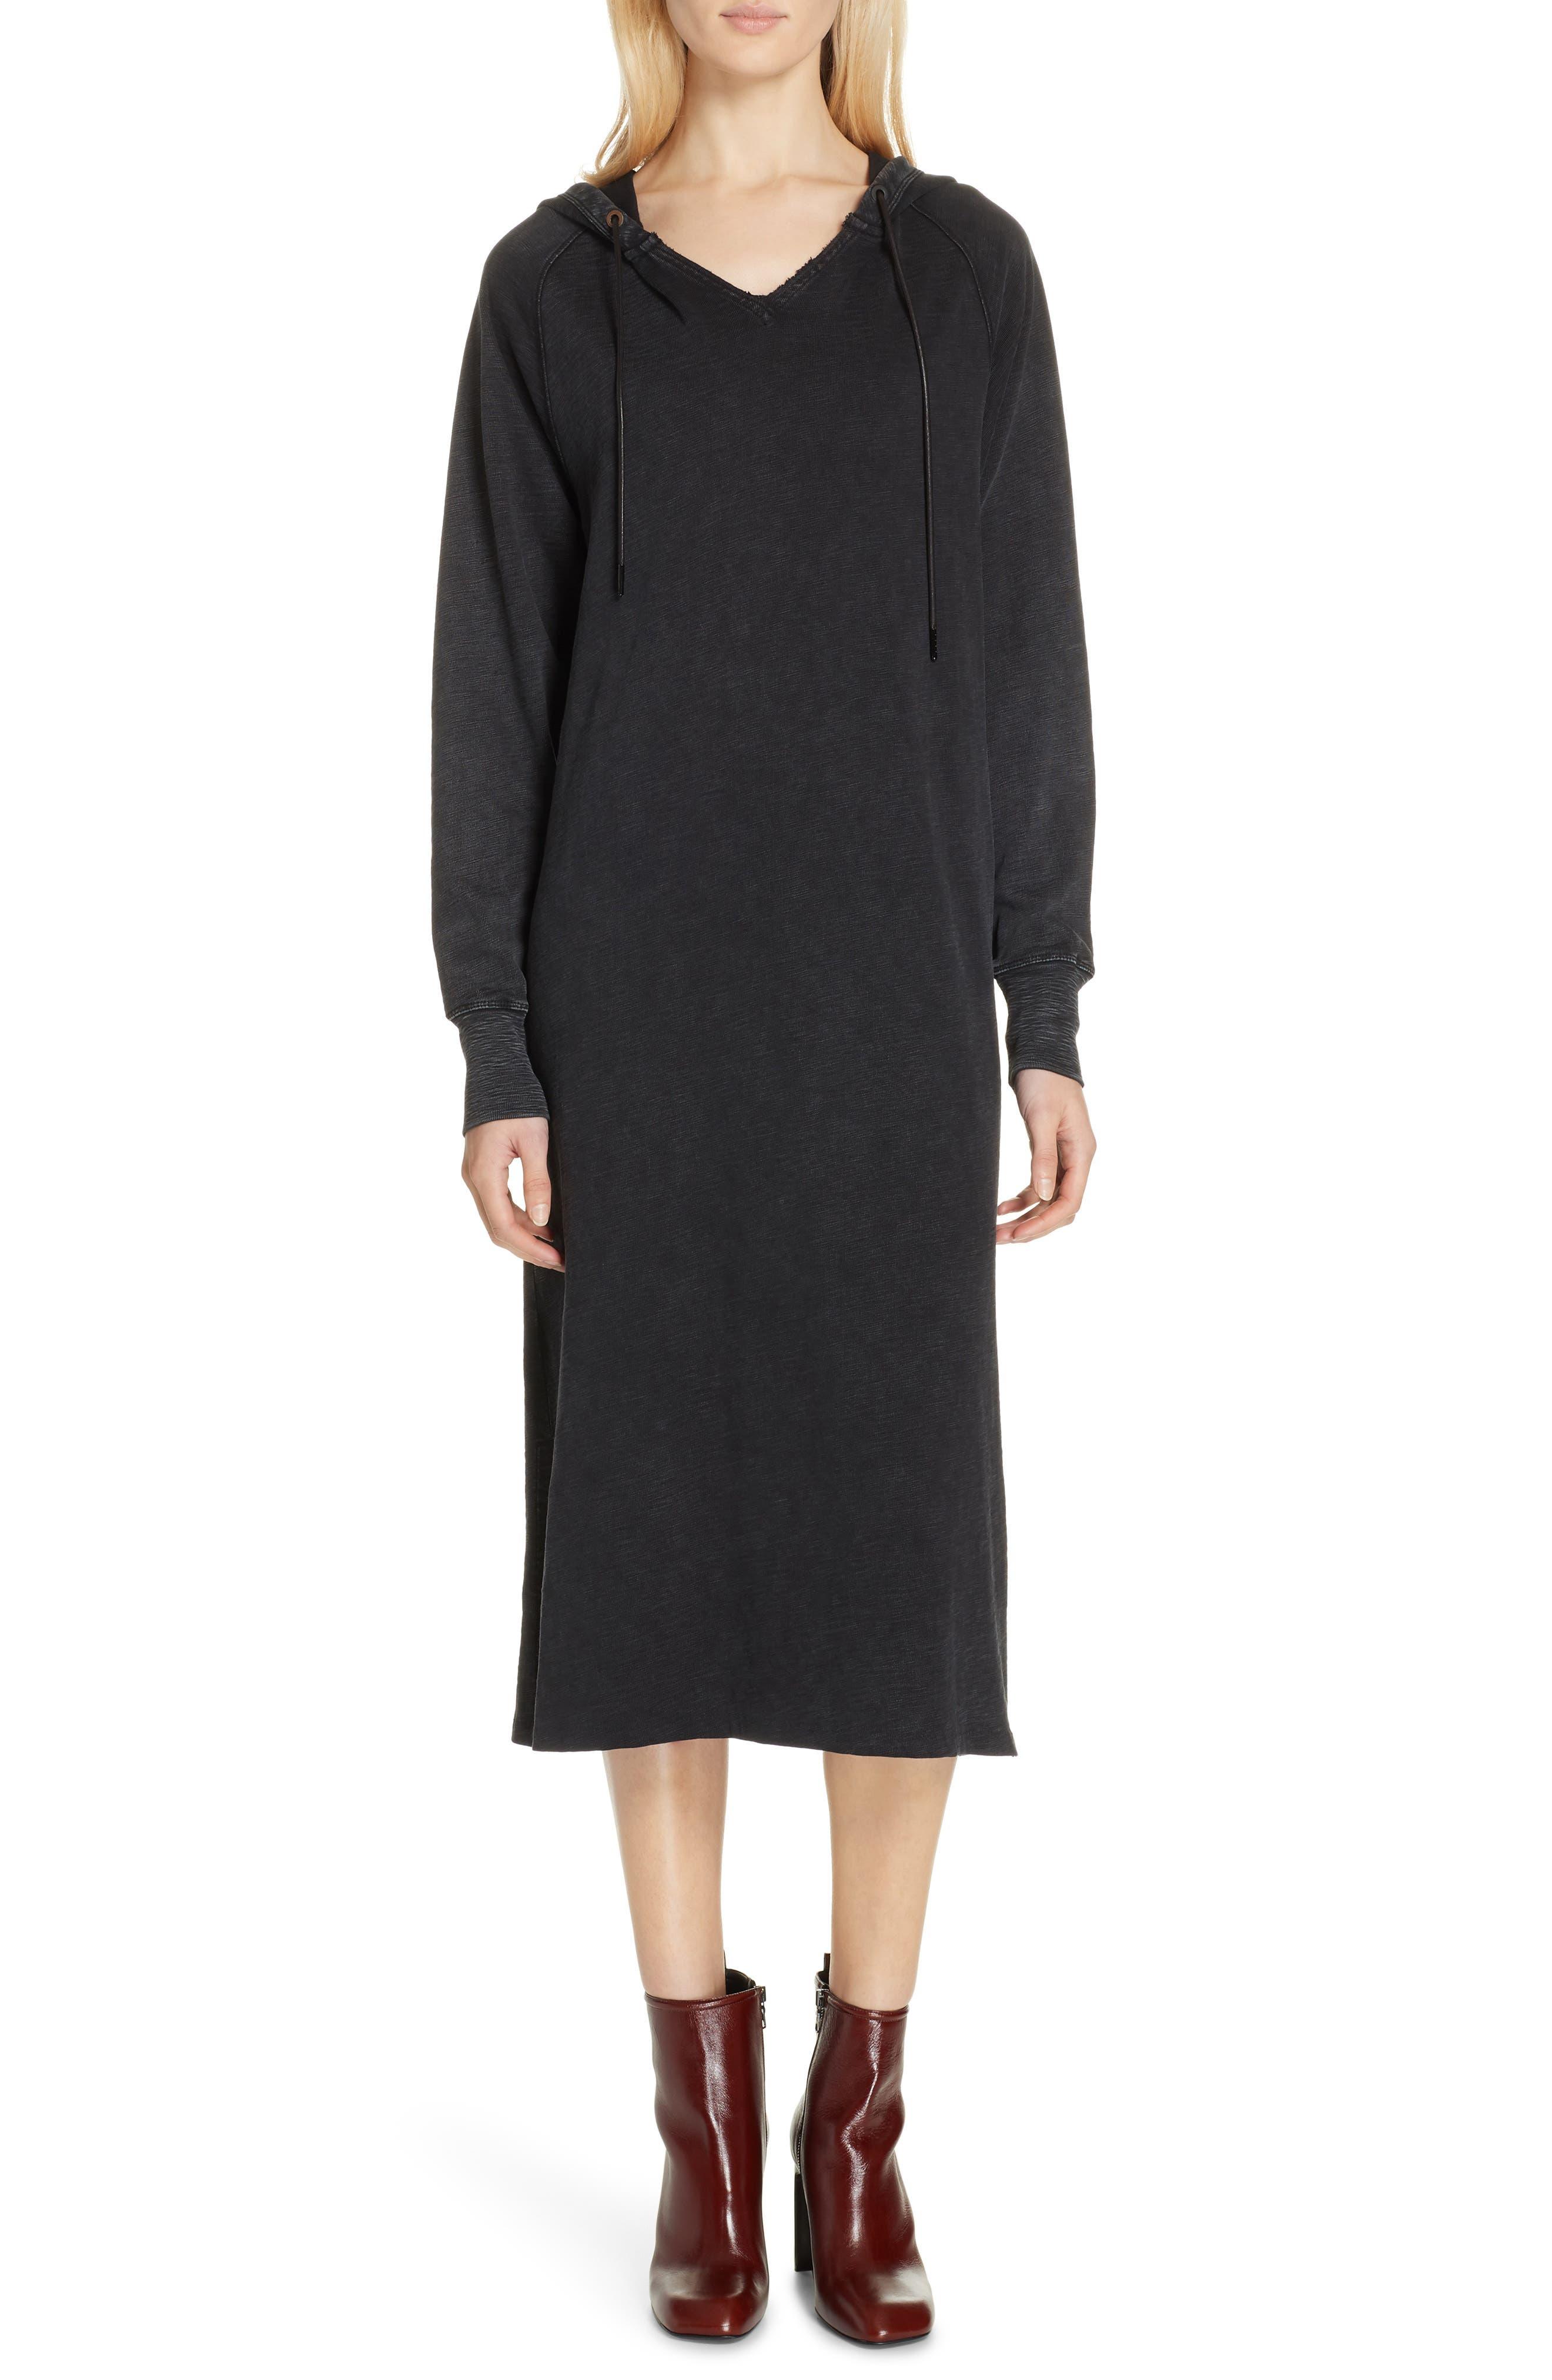 Rag & Bone Acid Wash Hooded Midi Dress, Black